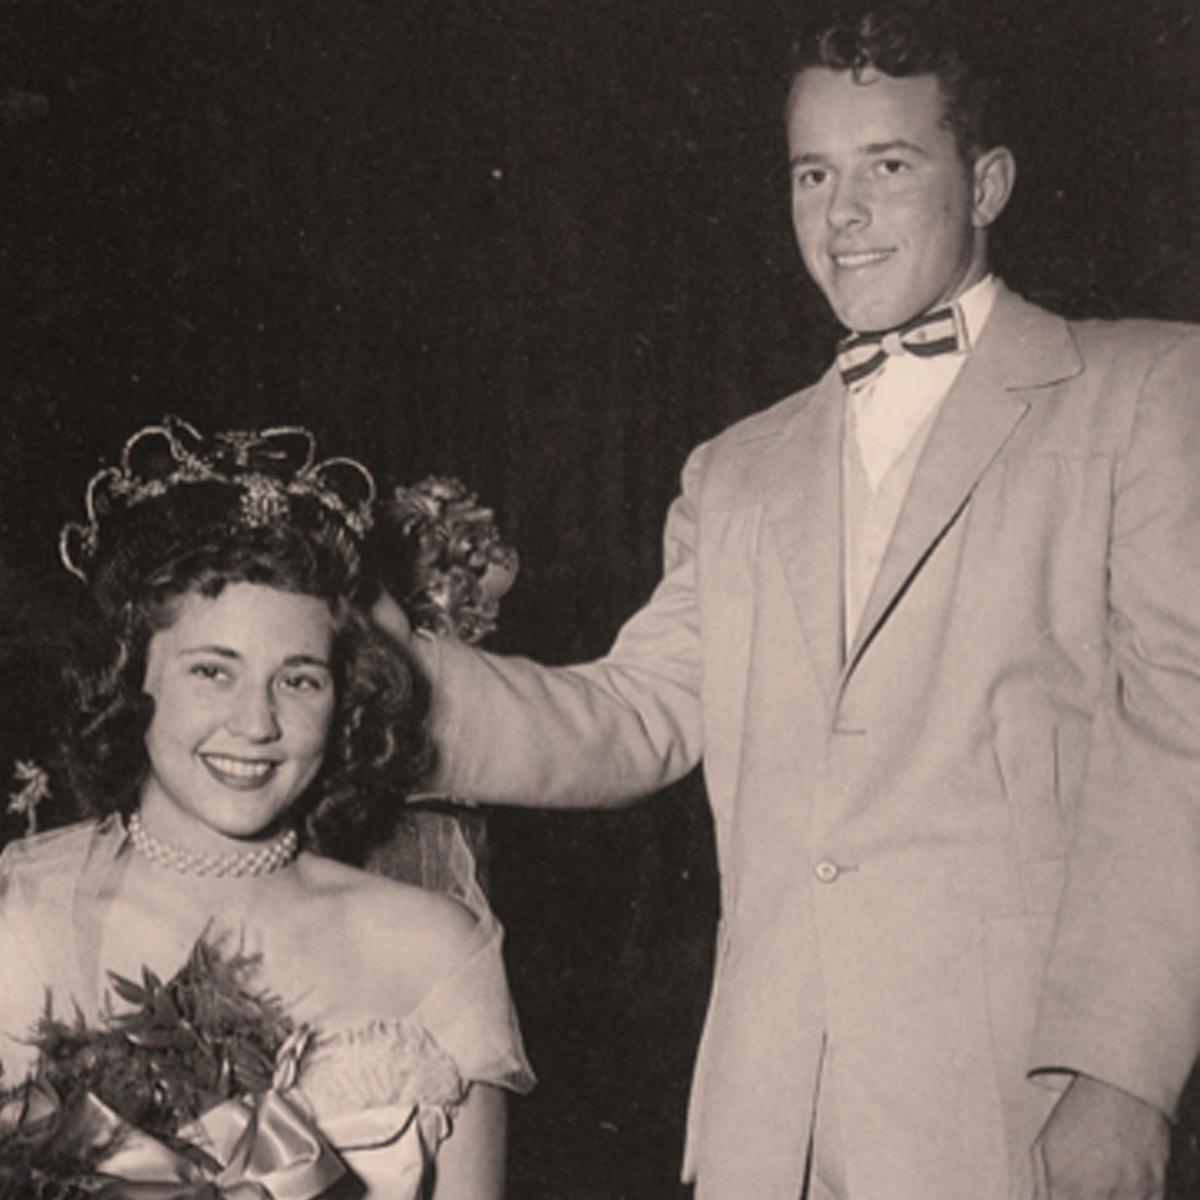 UMD Homecoming 1960